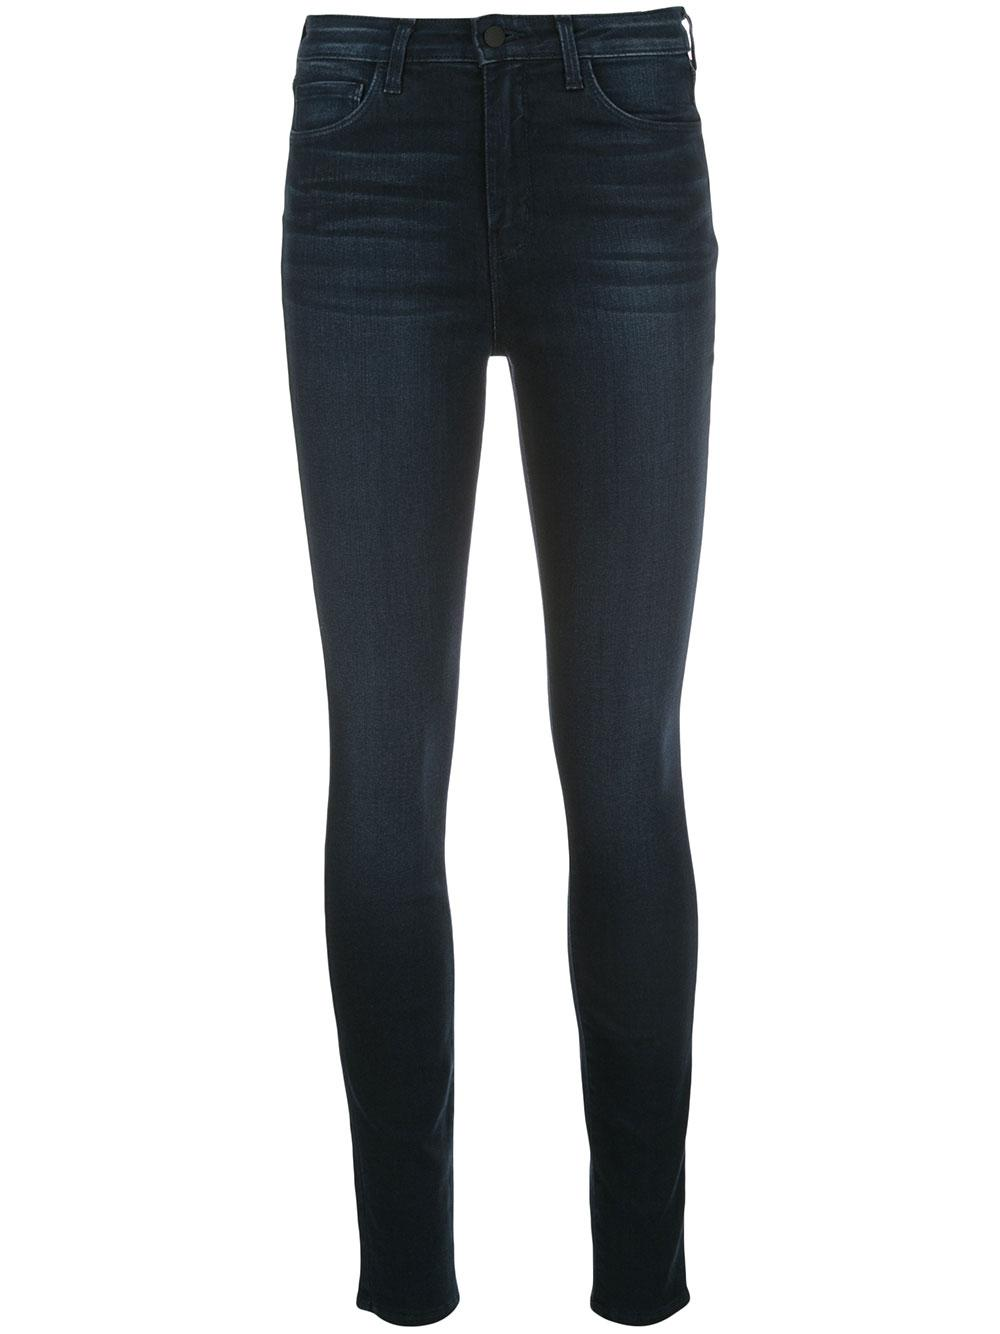 Marguerite High Rise Skinny Jean Item # 2352DXL